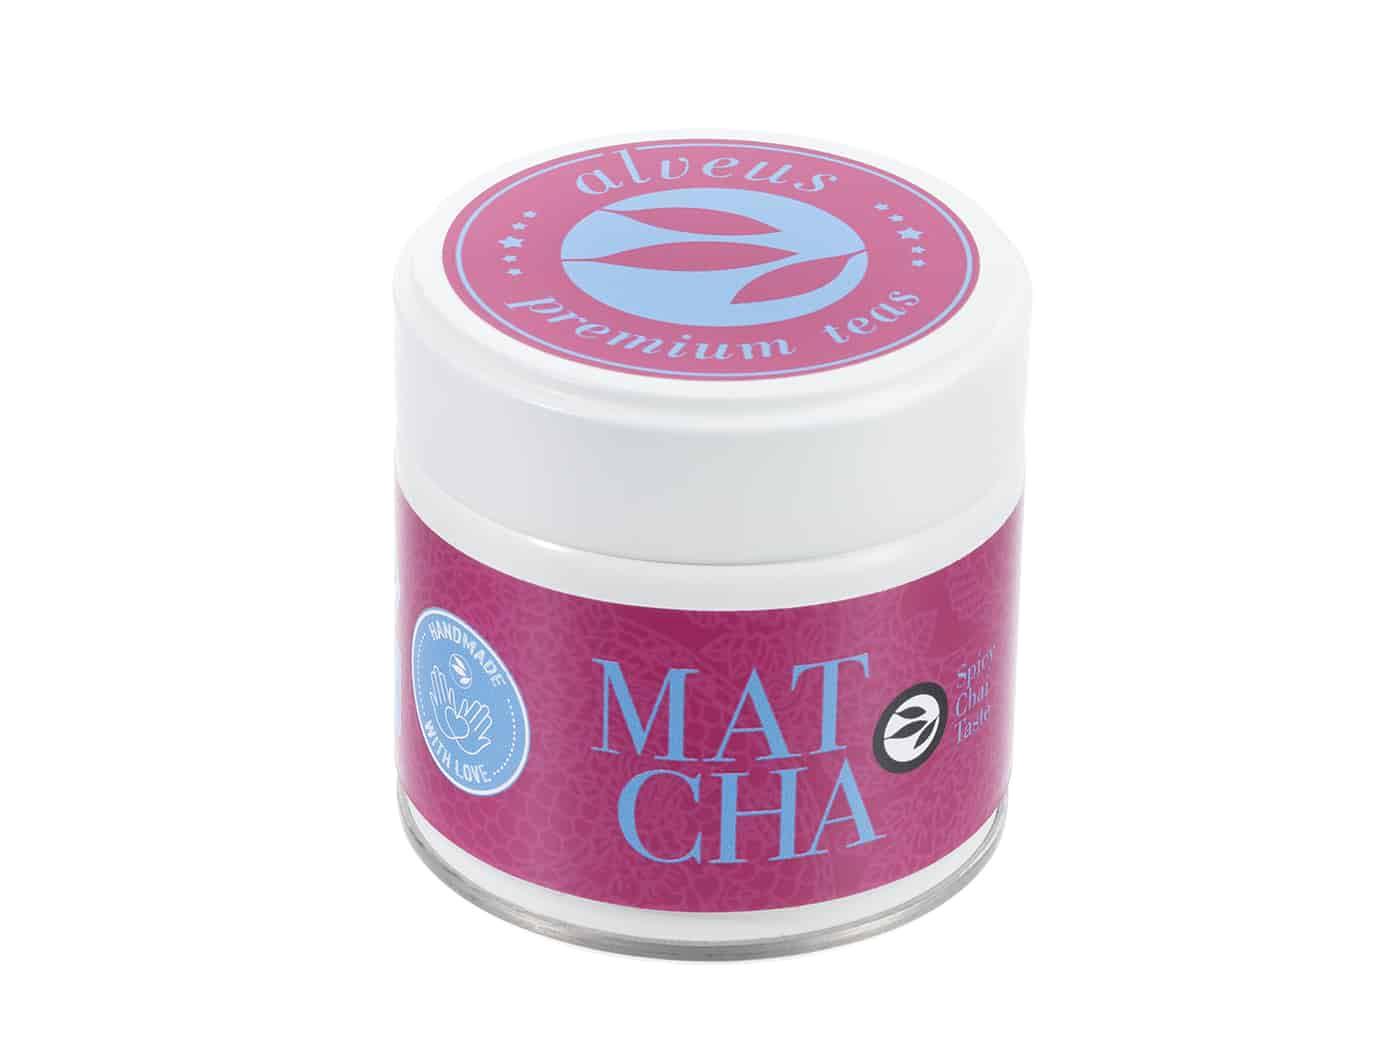 Bio Spicy Chai Matcha